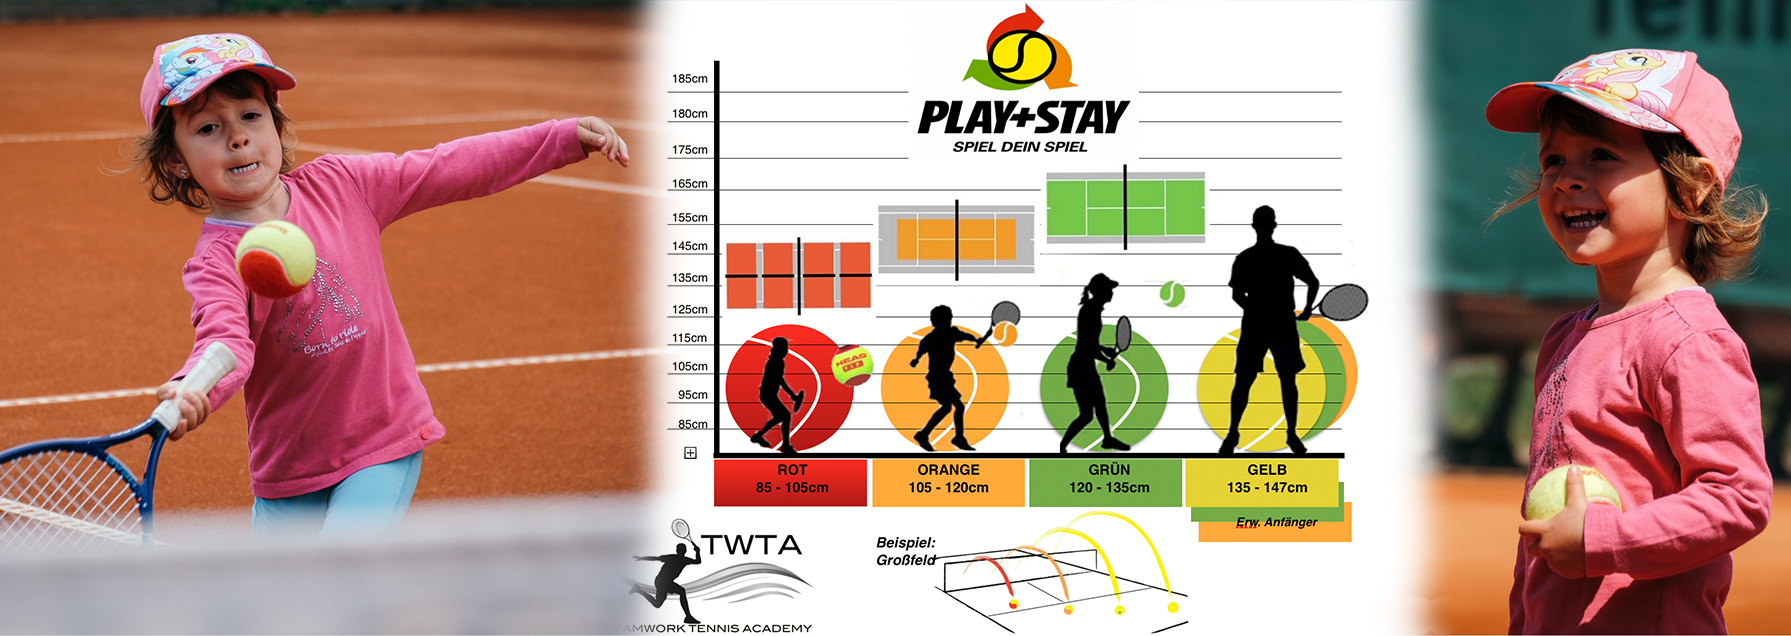 Play + Stay Konzept